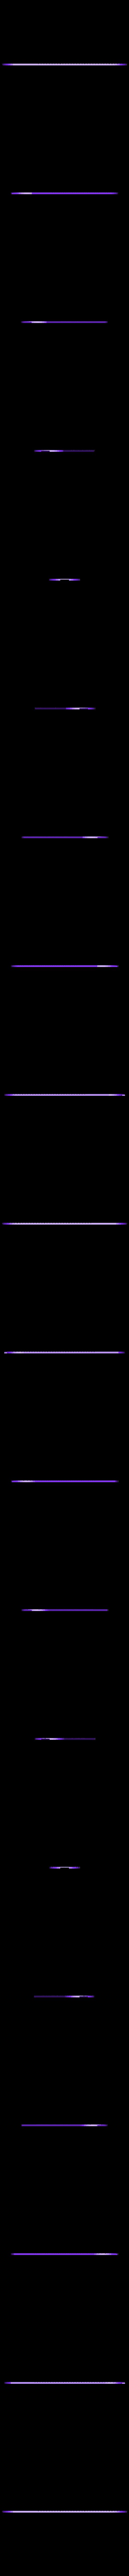 partie_haute.STL Download free STL file pedimeter • Object to 3D print, Thomy